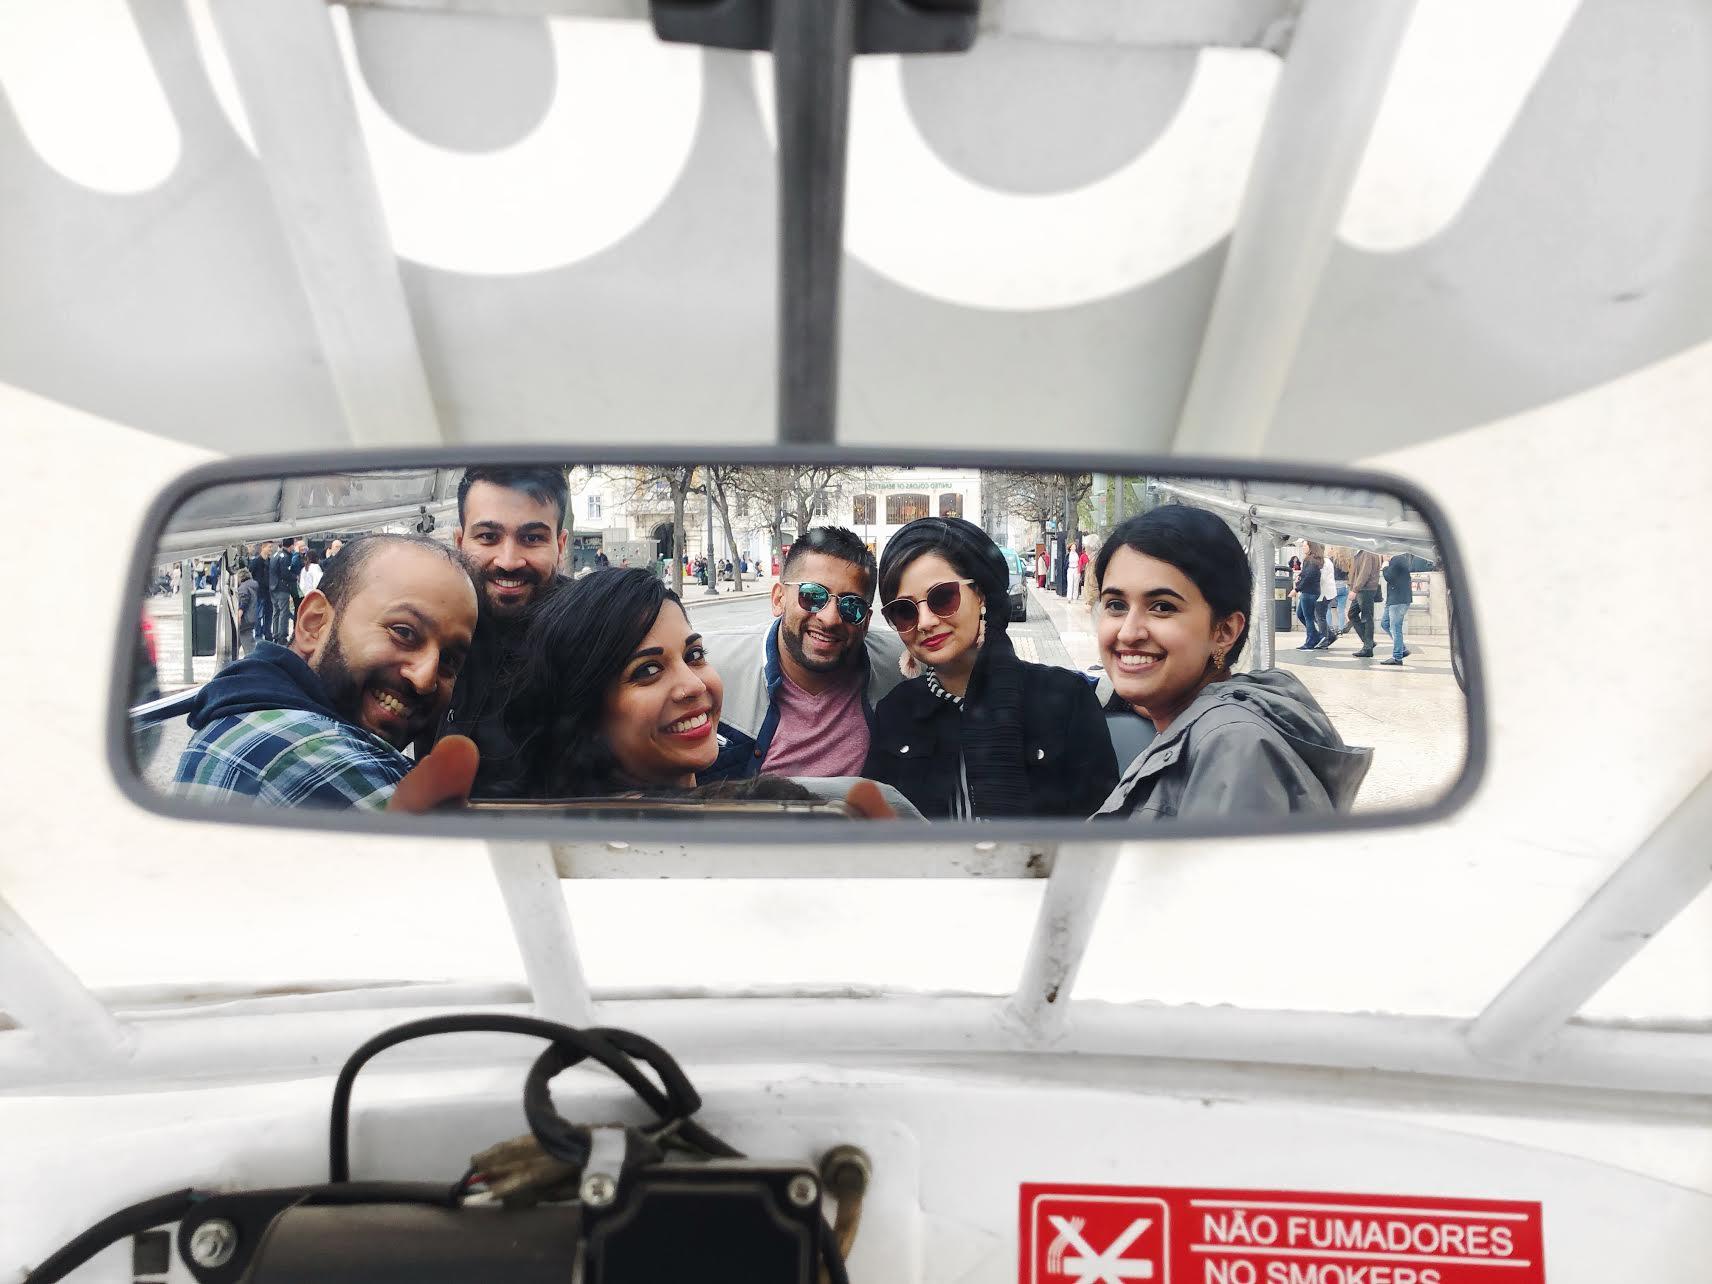 Muslim-halal-travel-guide-Lisbon-transportation-tuk-tuk